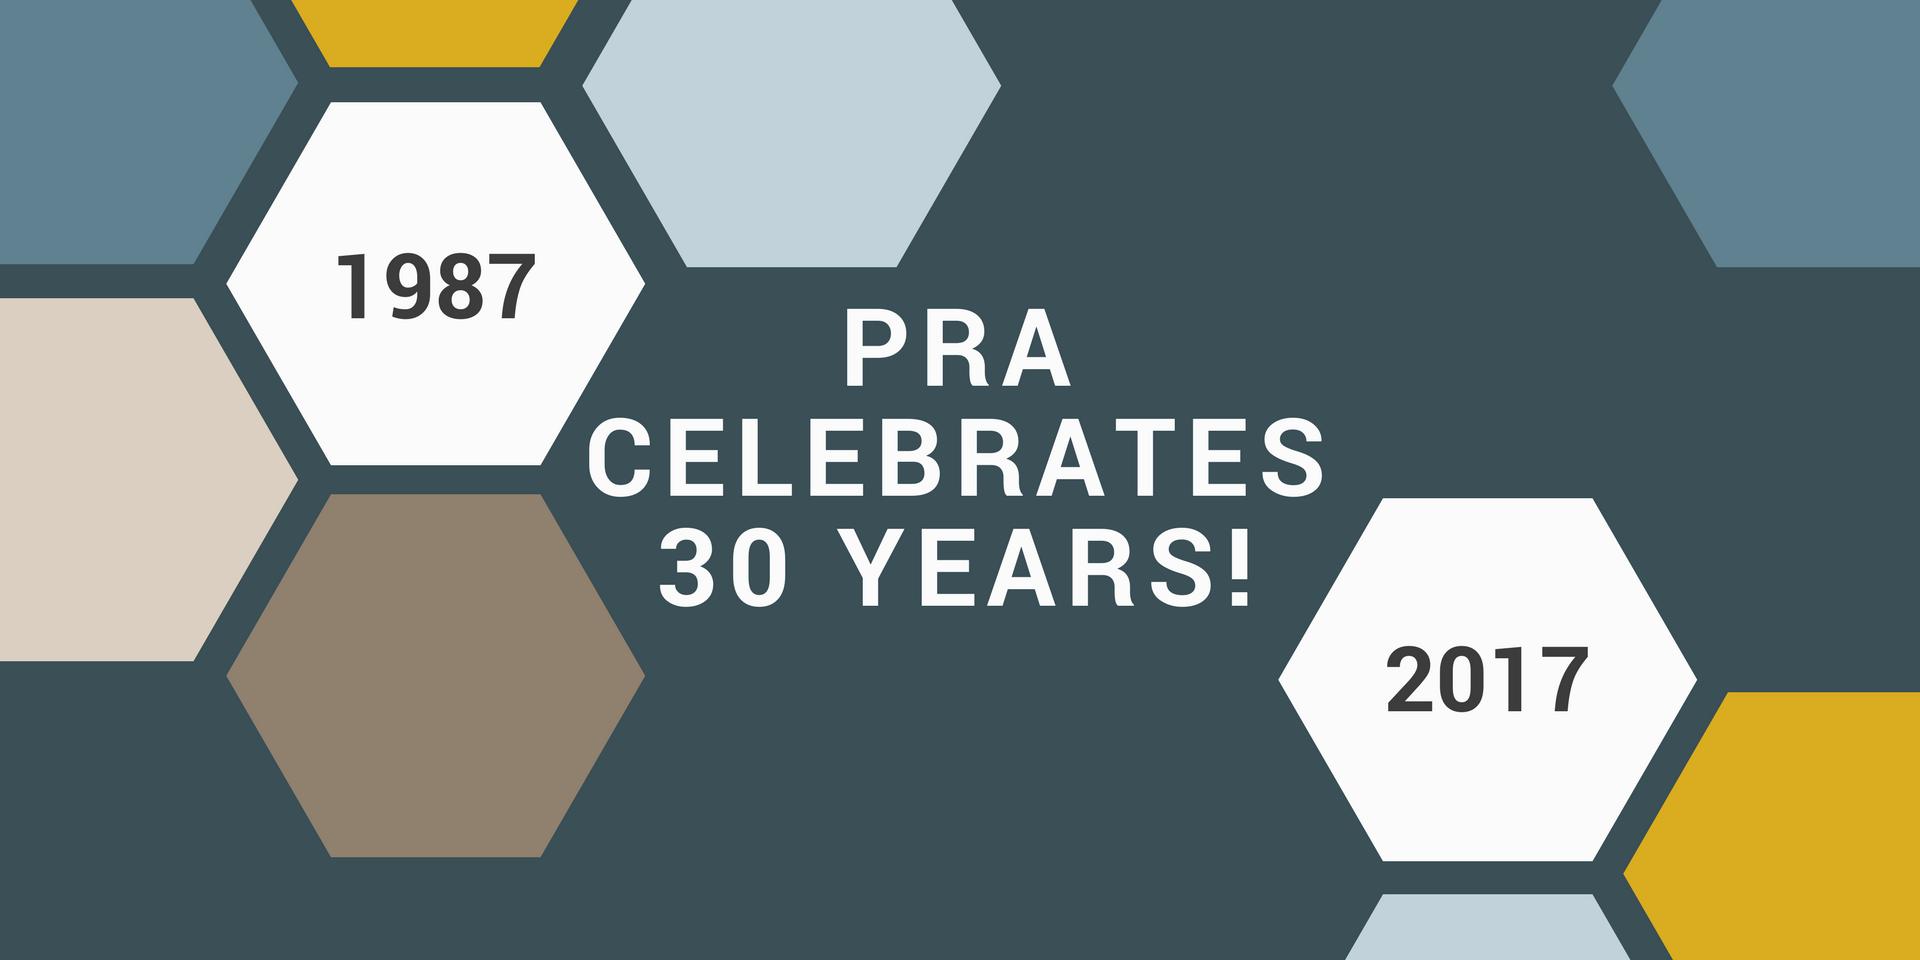 PRA Celebrates 30 Years